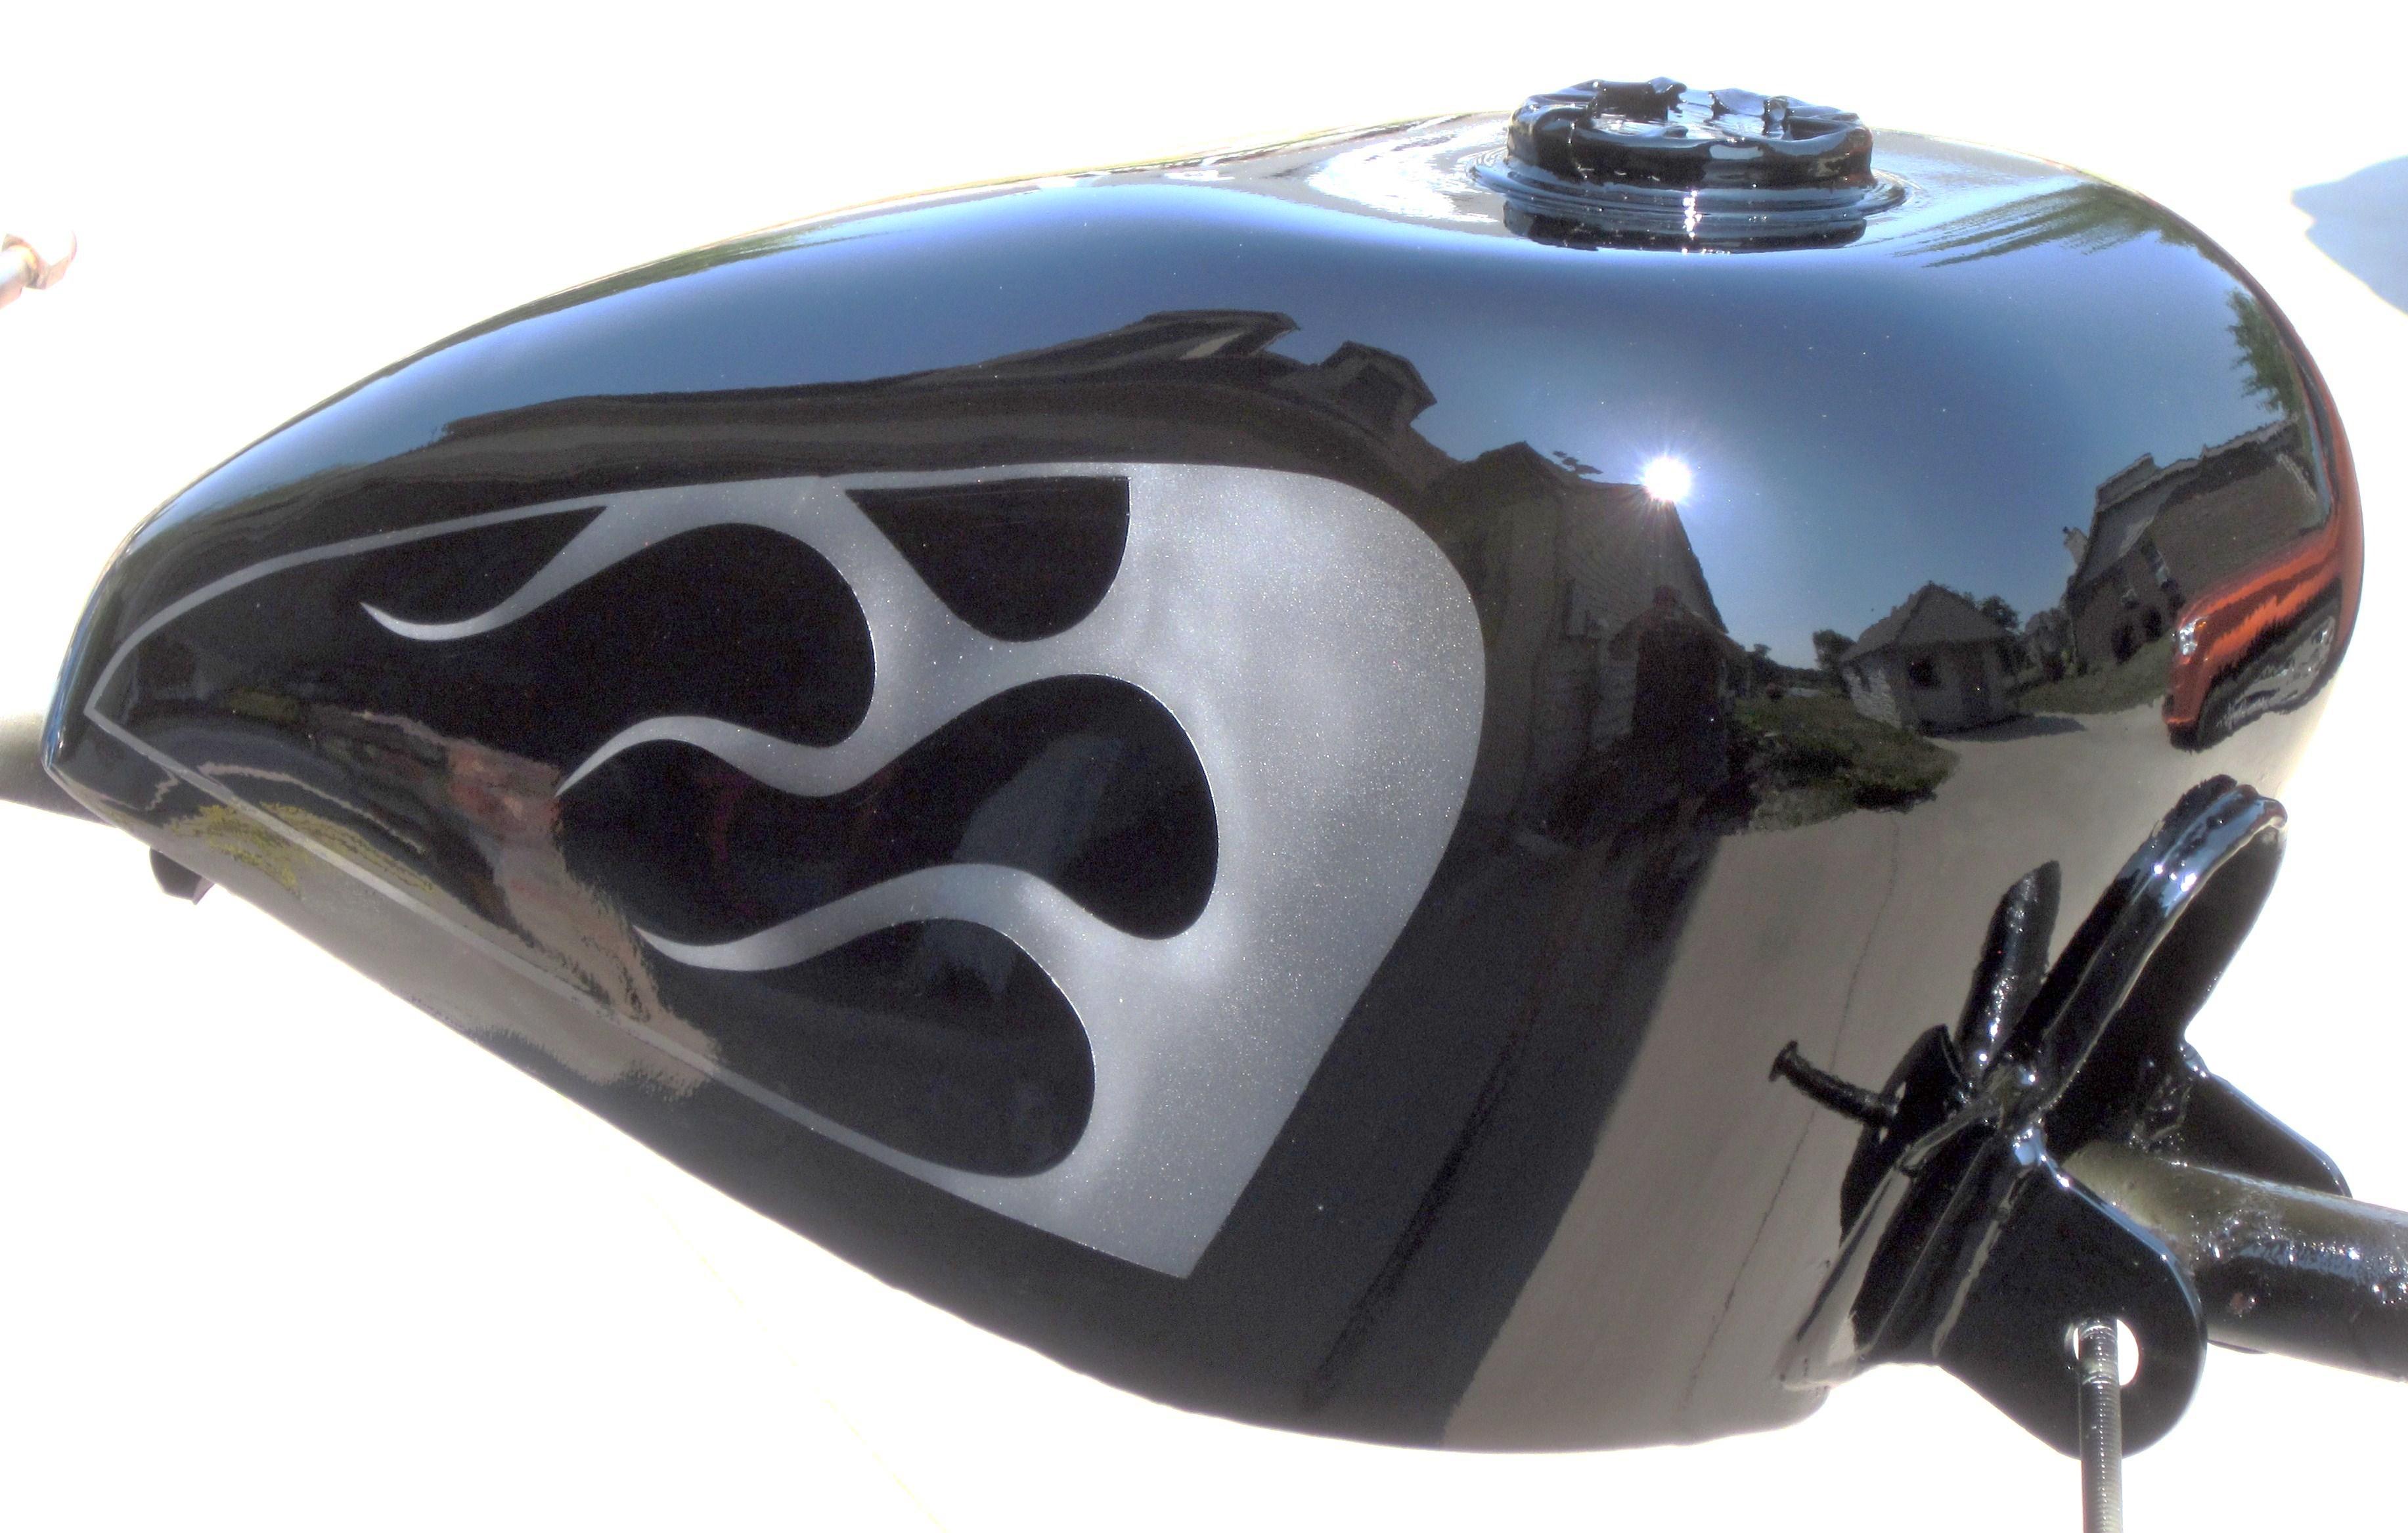 Click image for larger version  Name:bike, tank, paint gun 015.JPG Views:124 Size:1.05 MB ID:66202